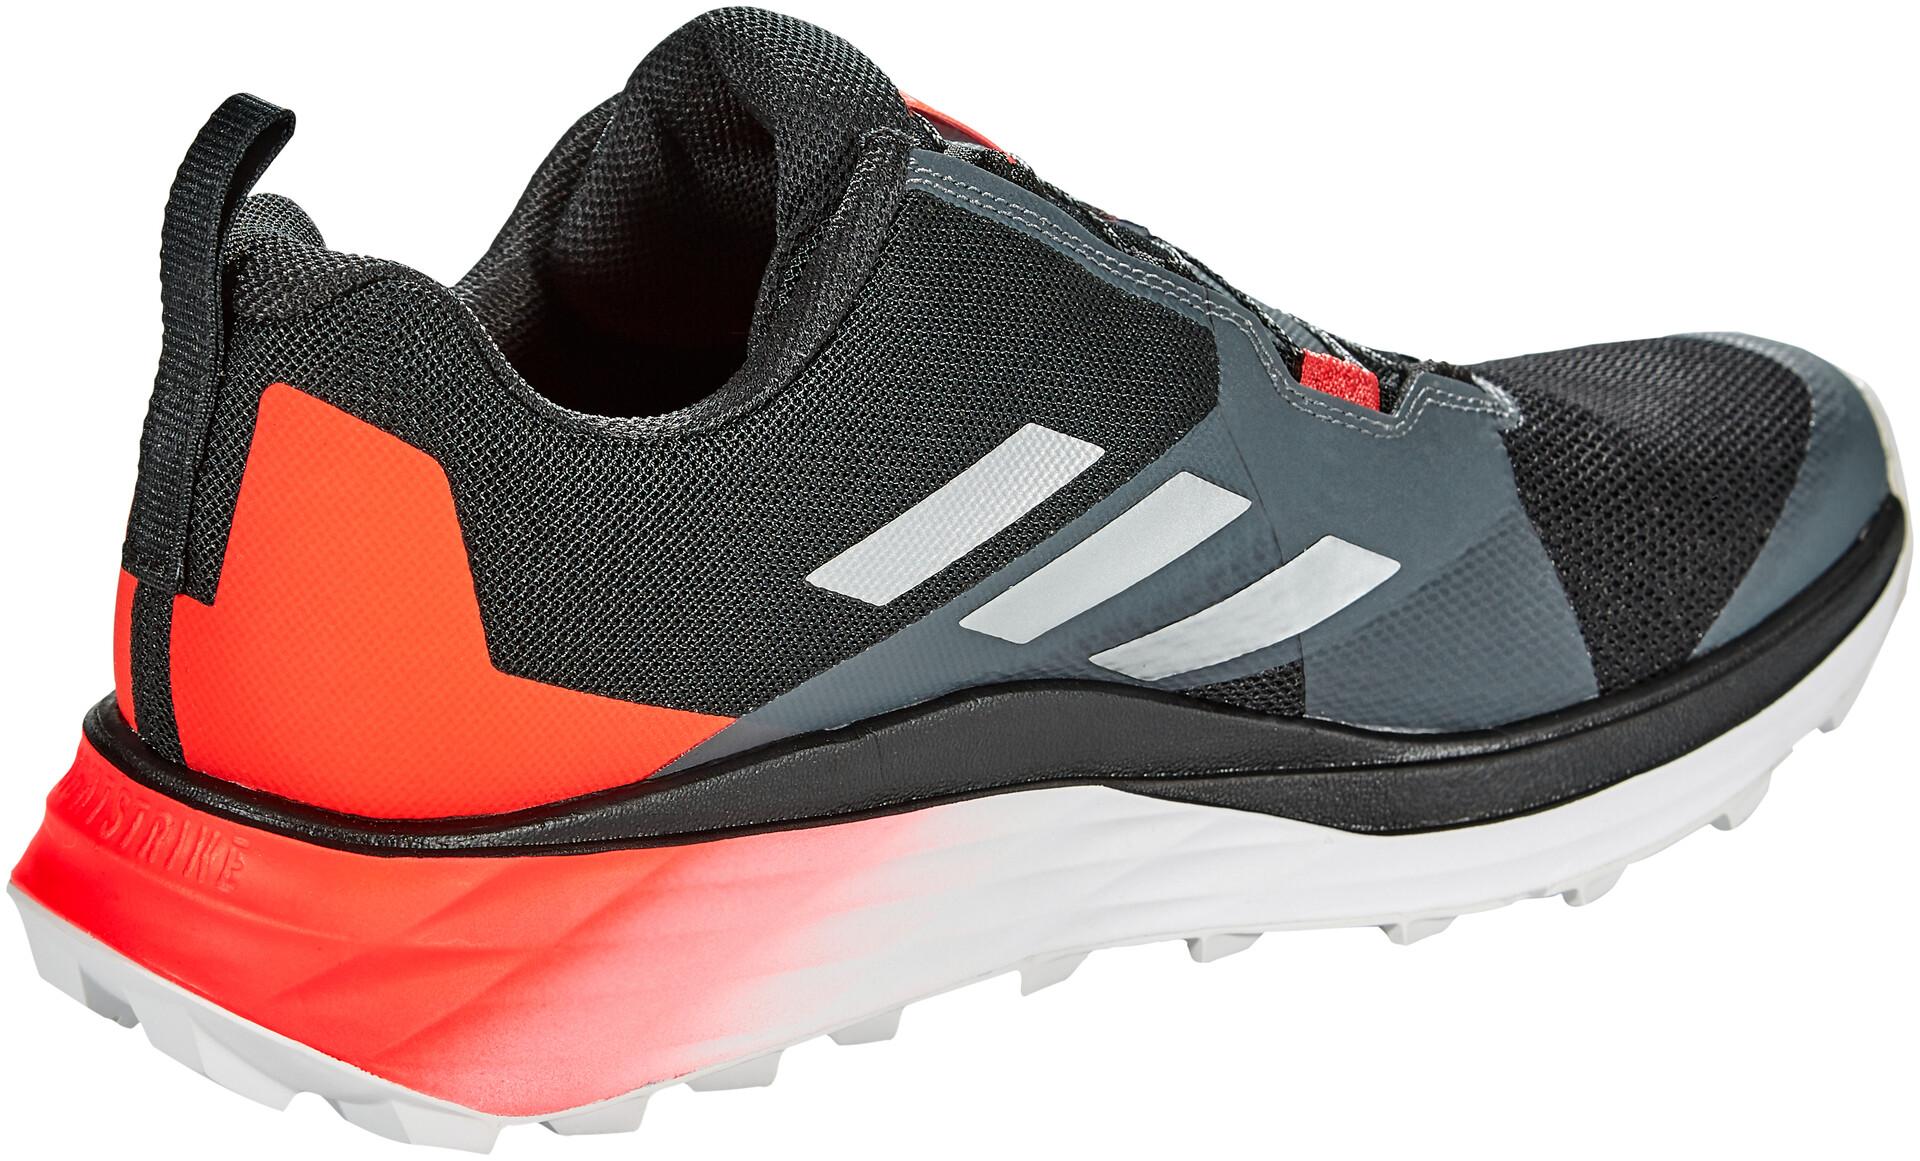 adidas TERREX Two Boa Løbesko Herrer, core blacksilver metalsolar red